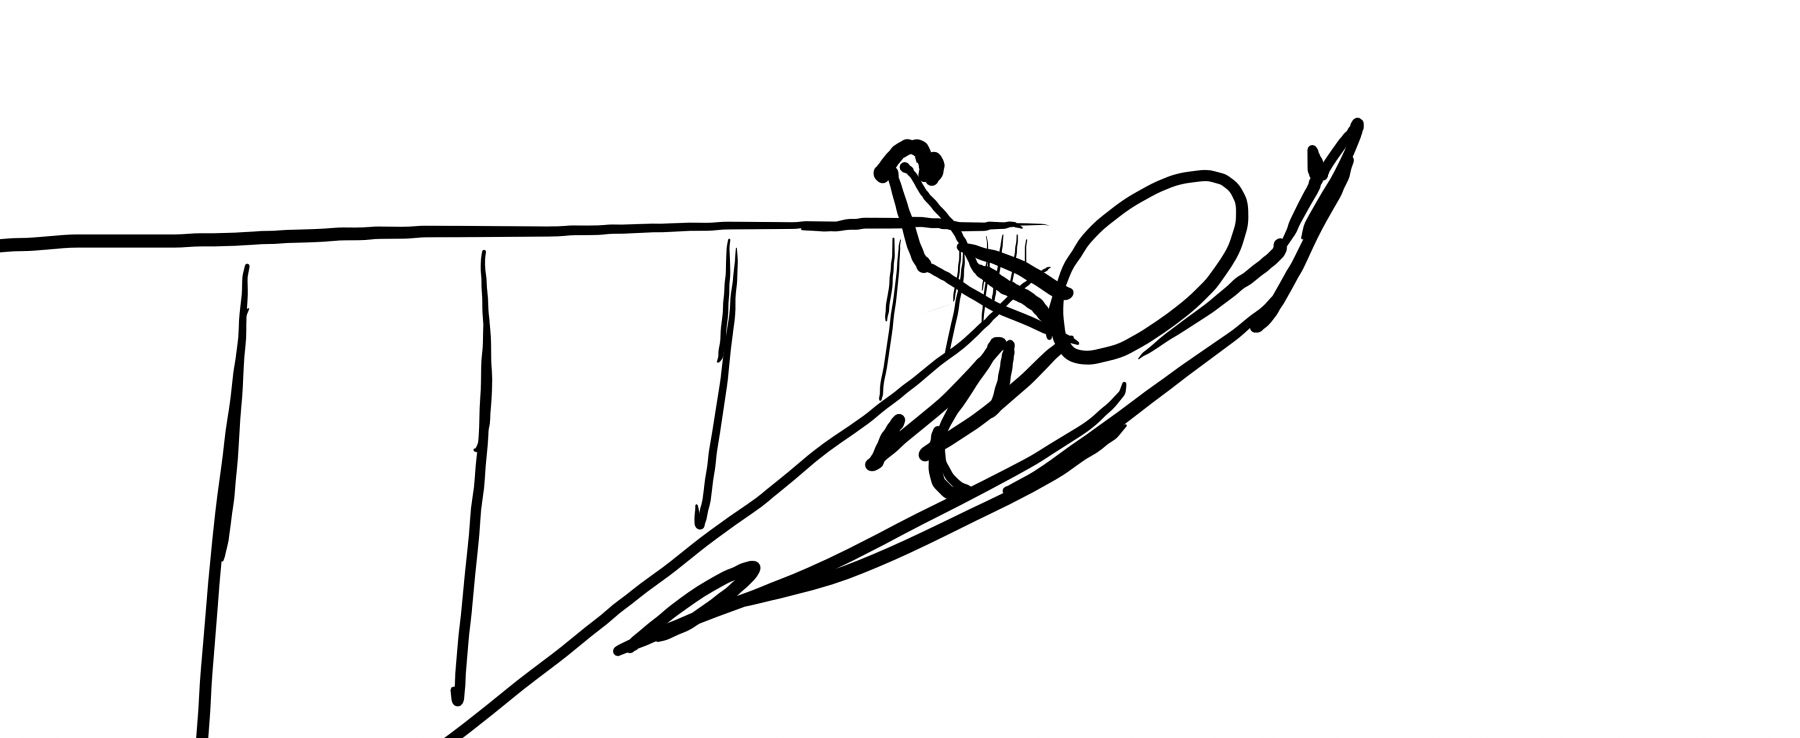 Nut-Thumbnail-Rough-Board00298